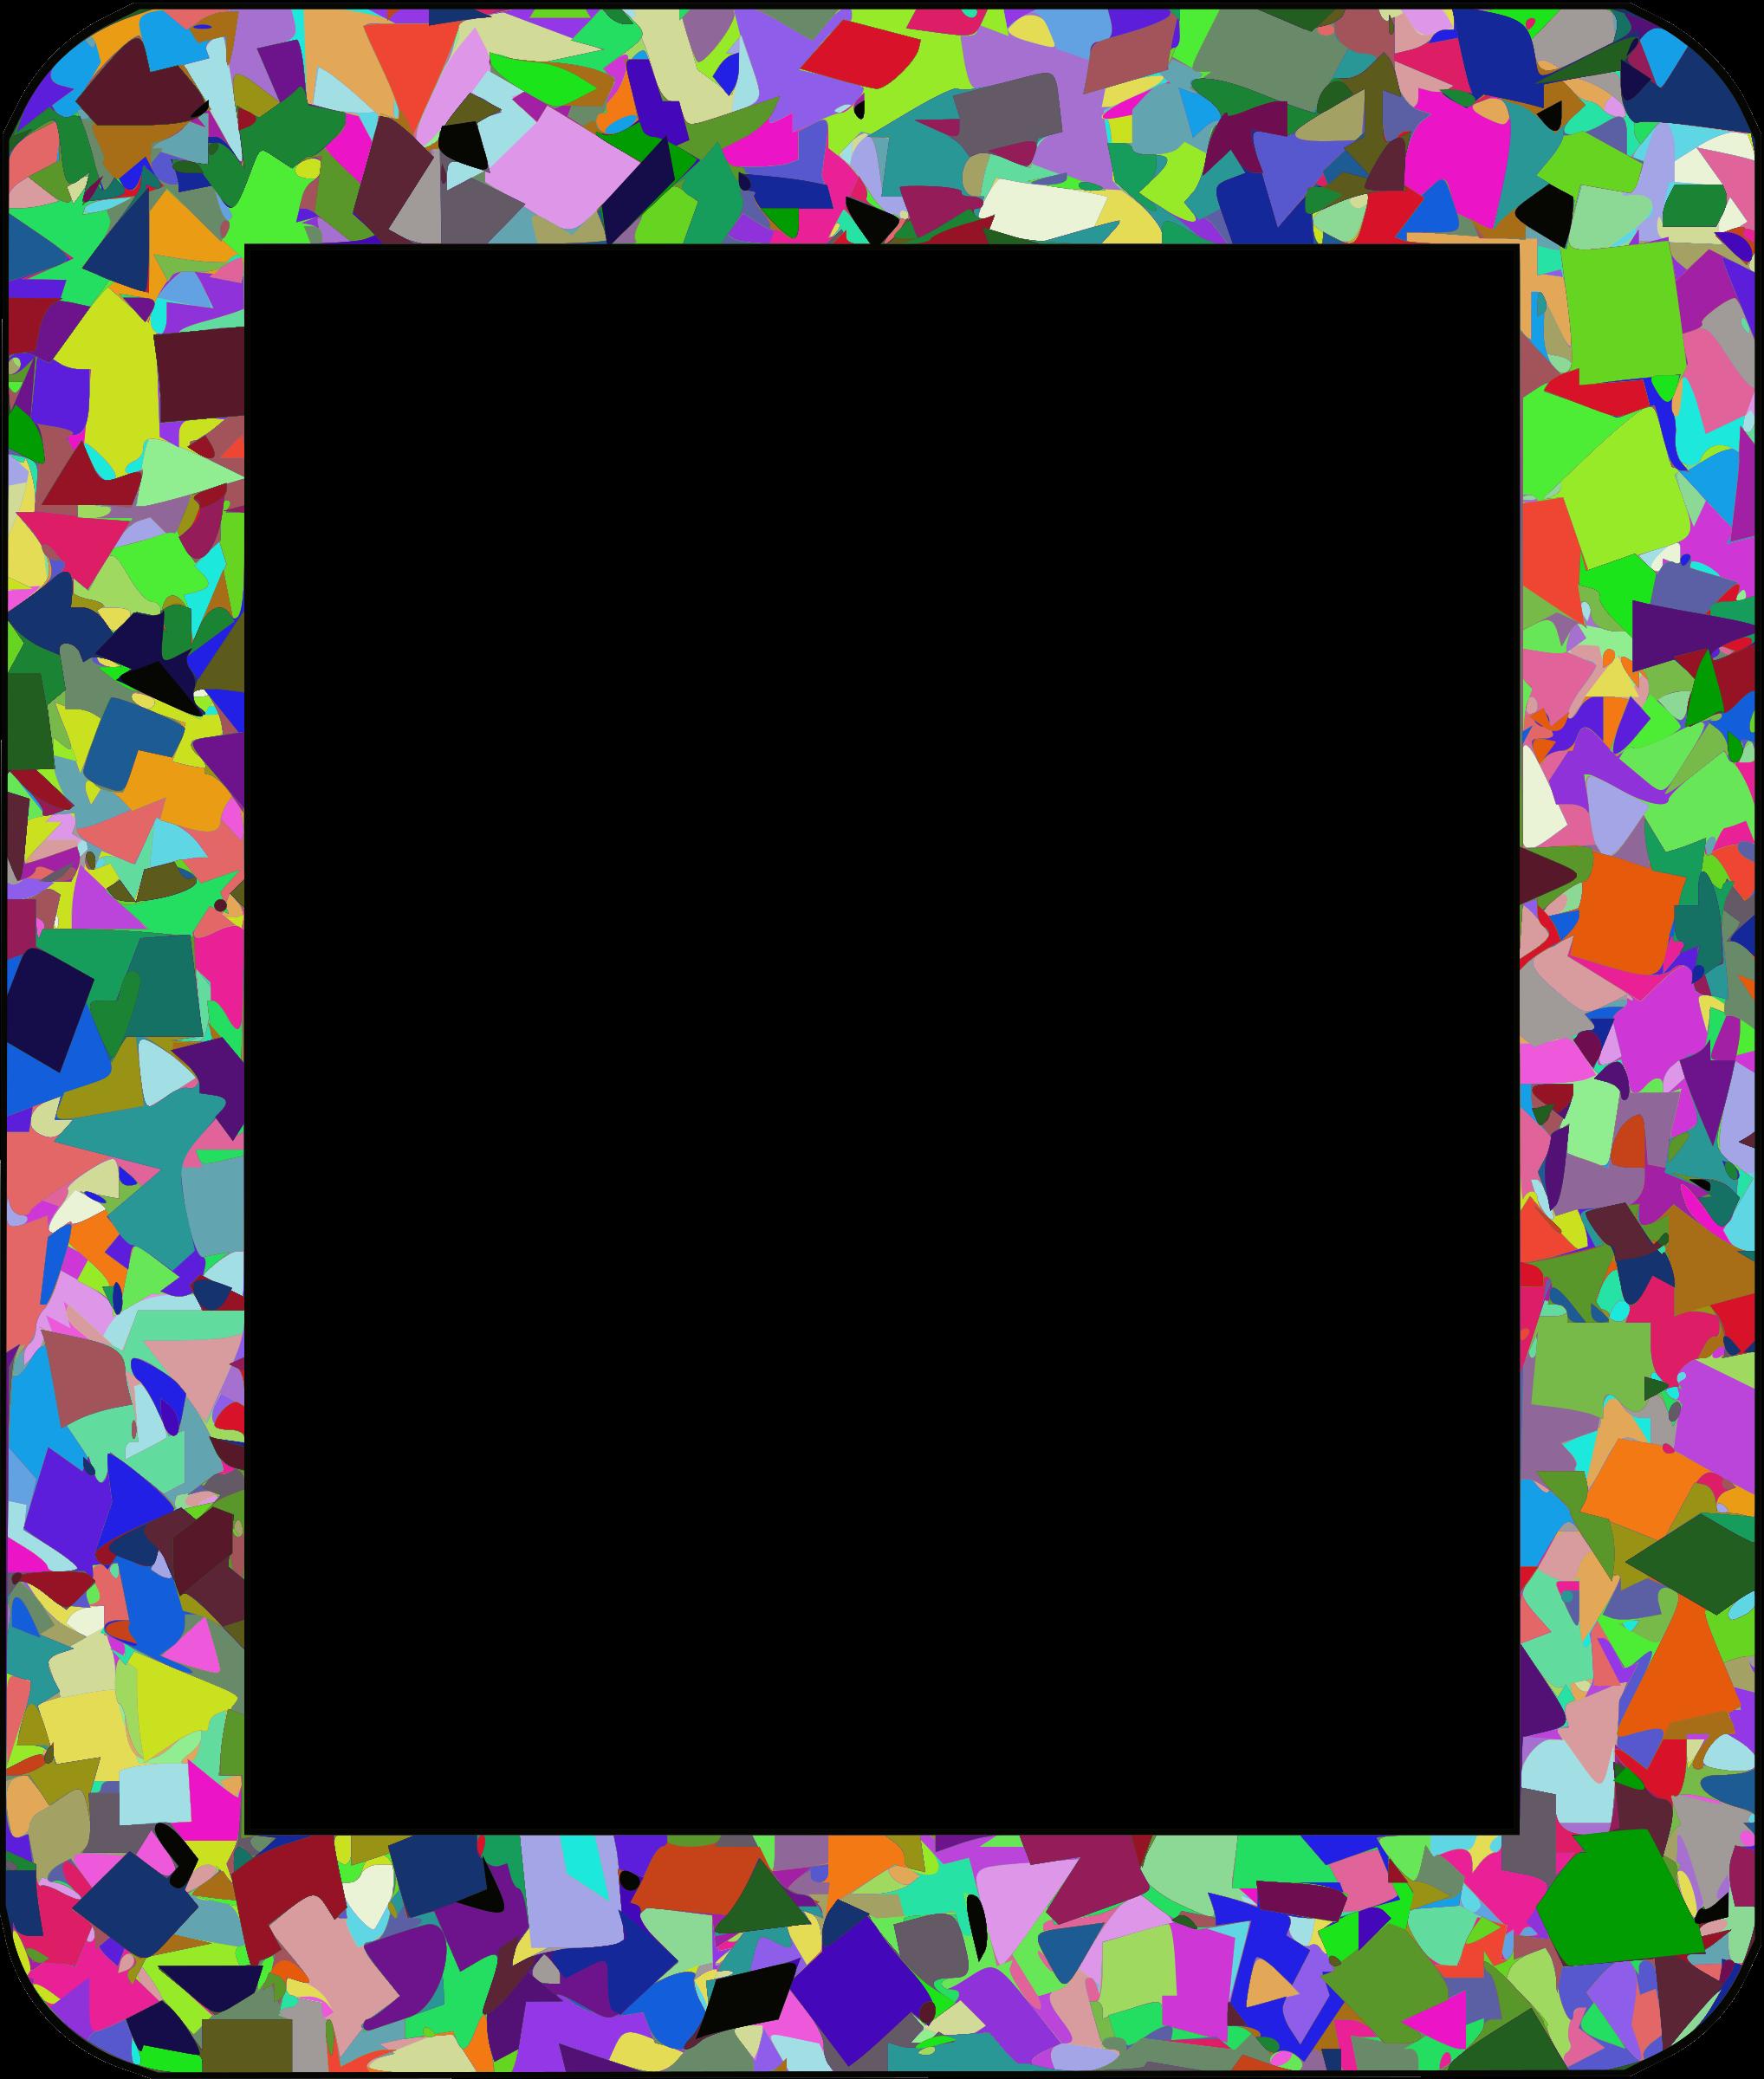 Clipart border confetti. Frame big image png